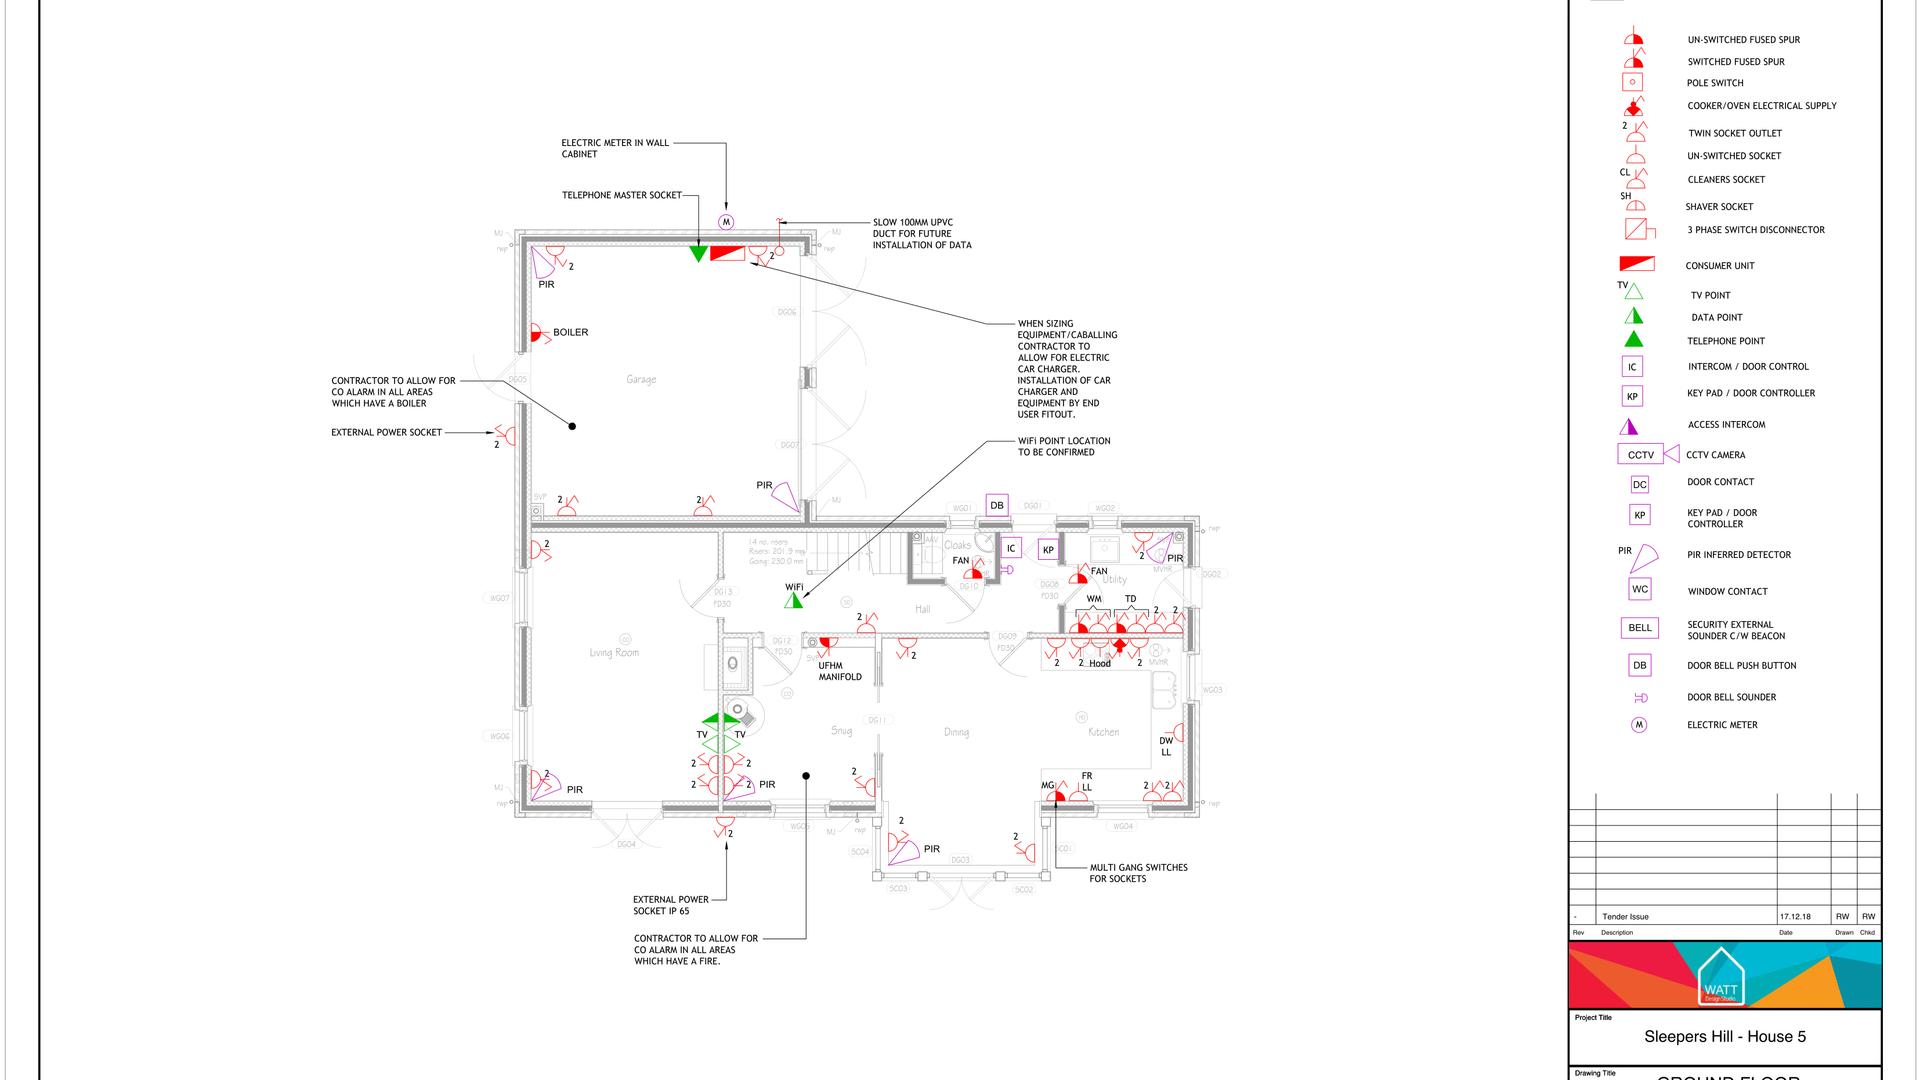 E V00 - Sleepers Hill - House 5 - Small